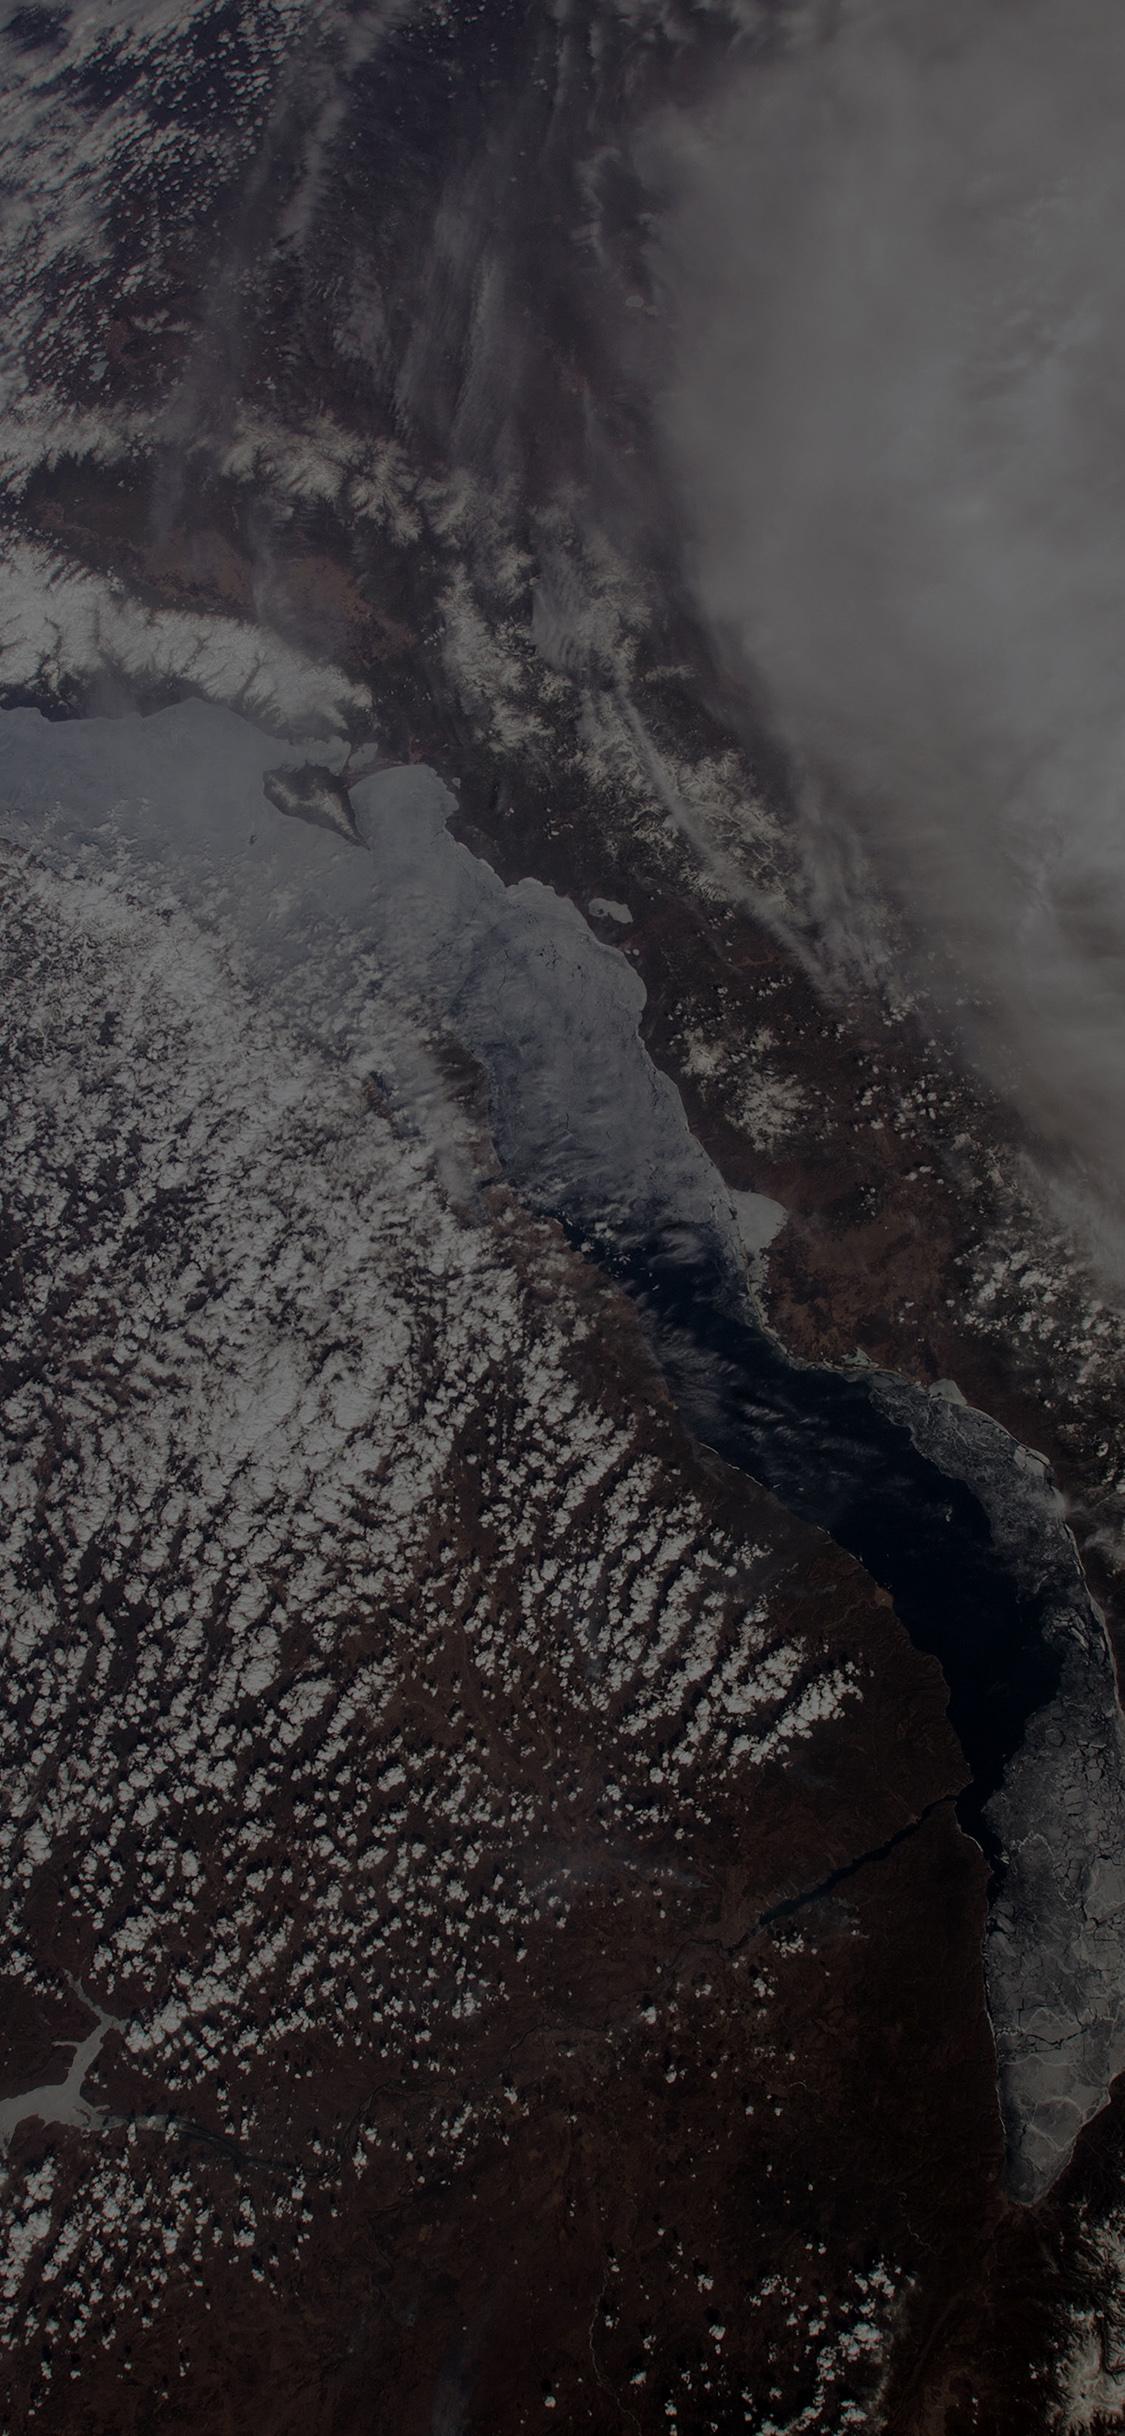 iPhonexpapers.com-Apple-iPhone-wallpaper-mu71-space-earth-from-sky-land-cloud-dark